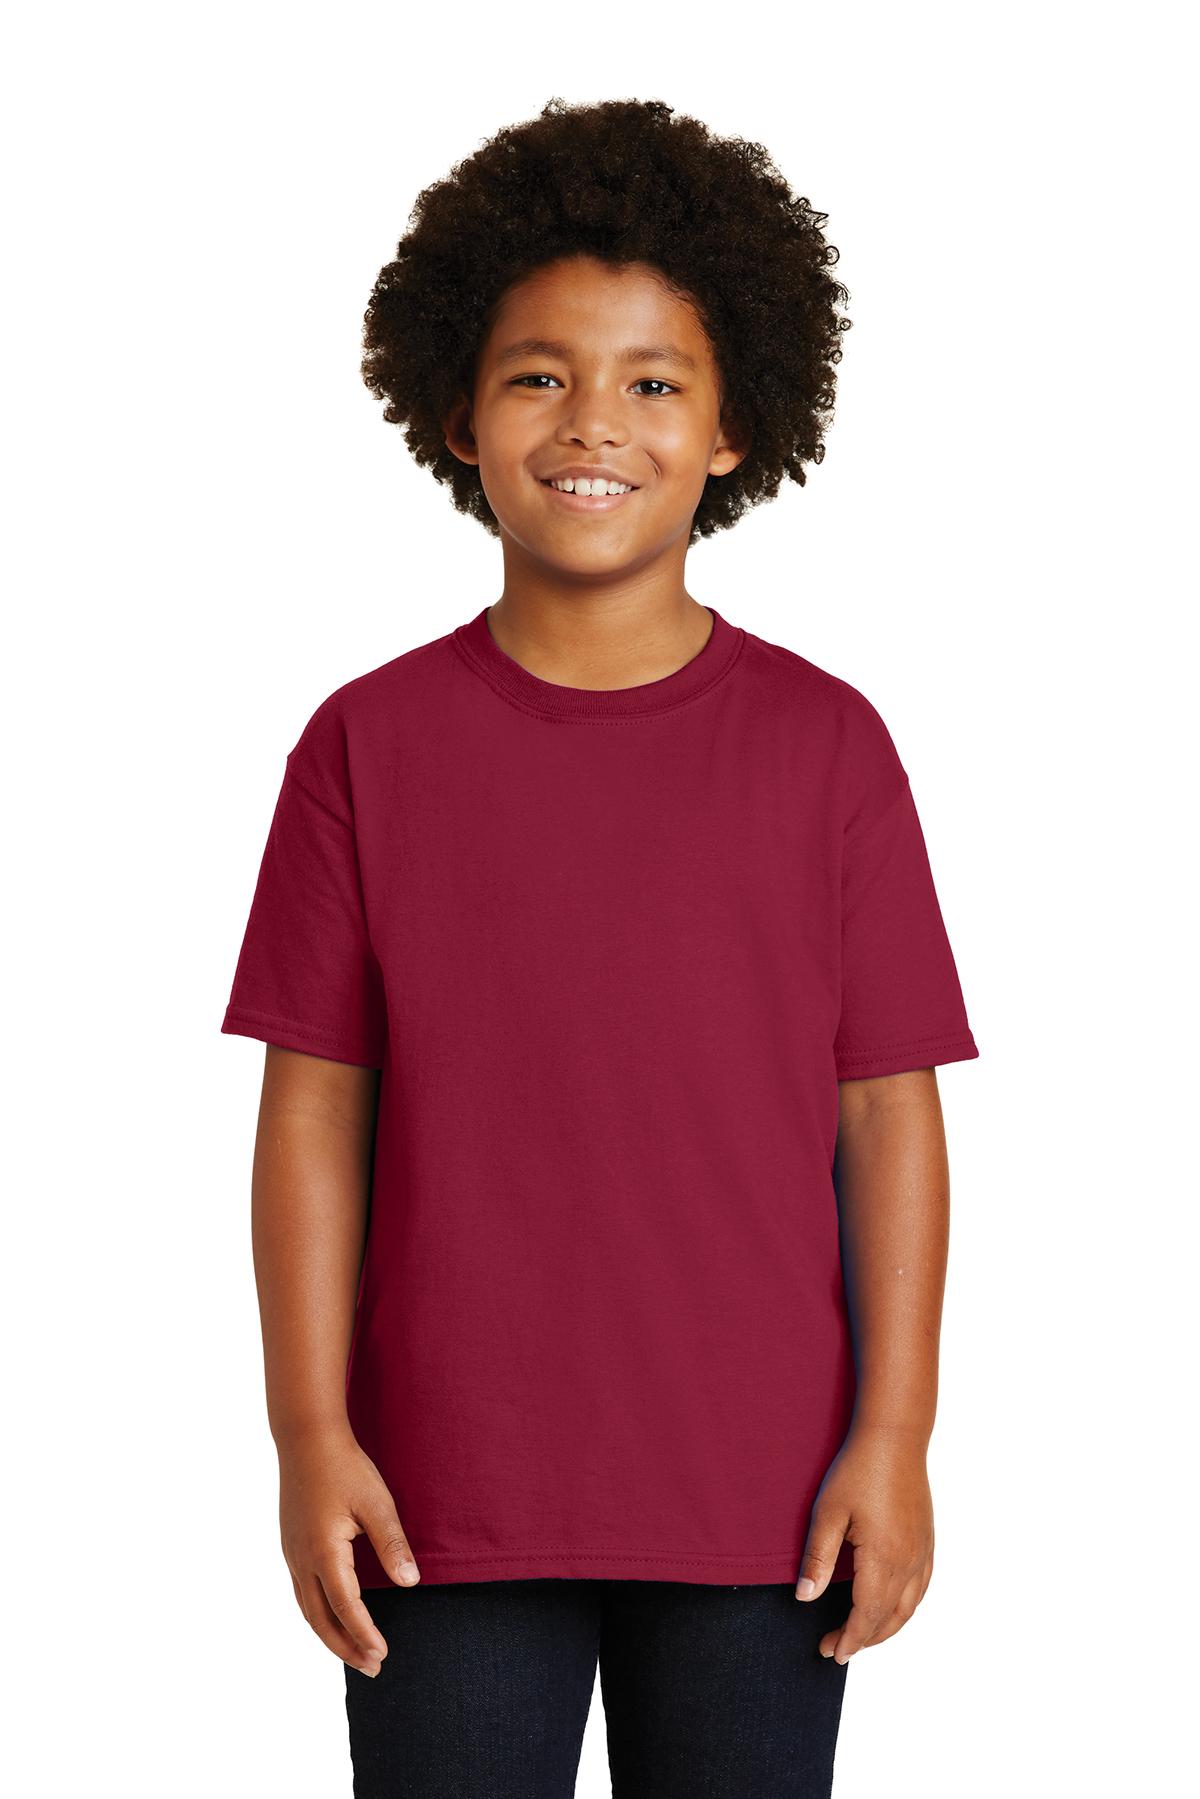 Gildan Youth Ultra Cotton 100 T Shirt 6 61 Cardinal Girl Navy Xl Shirts Sanmar